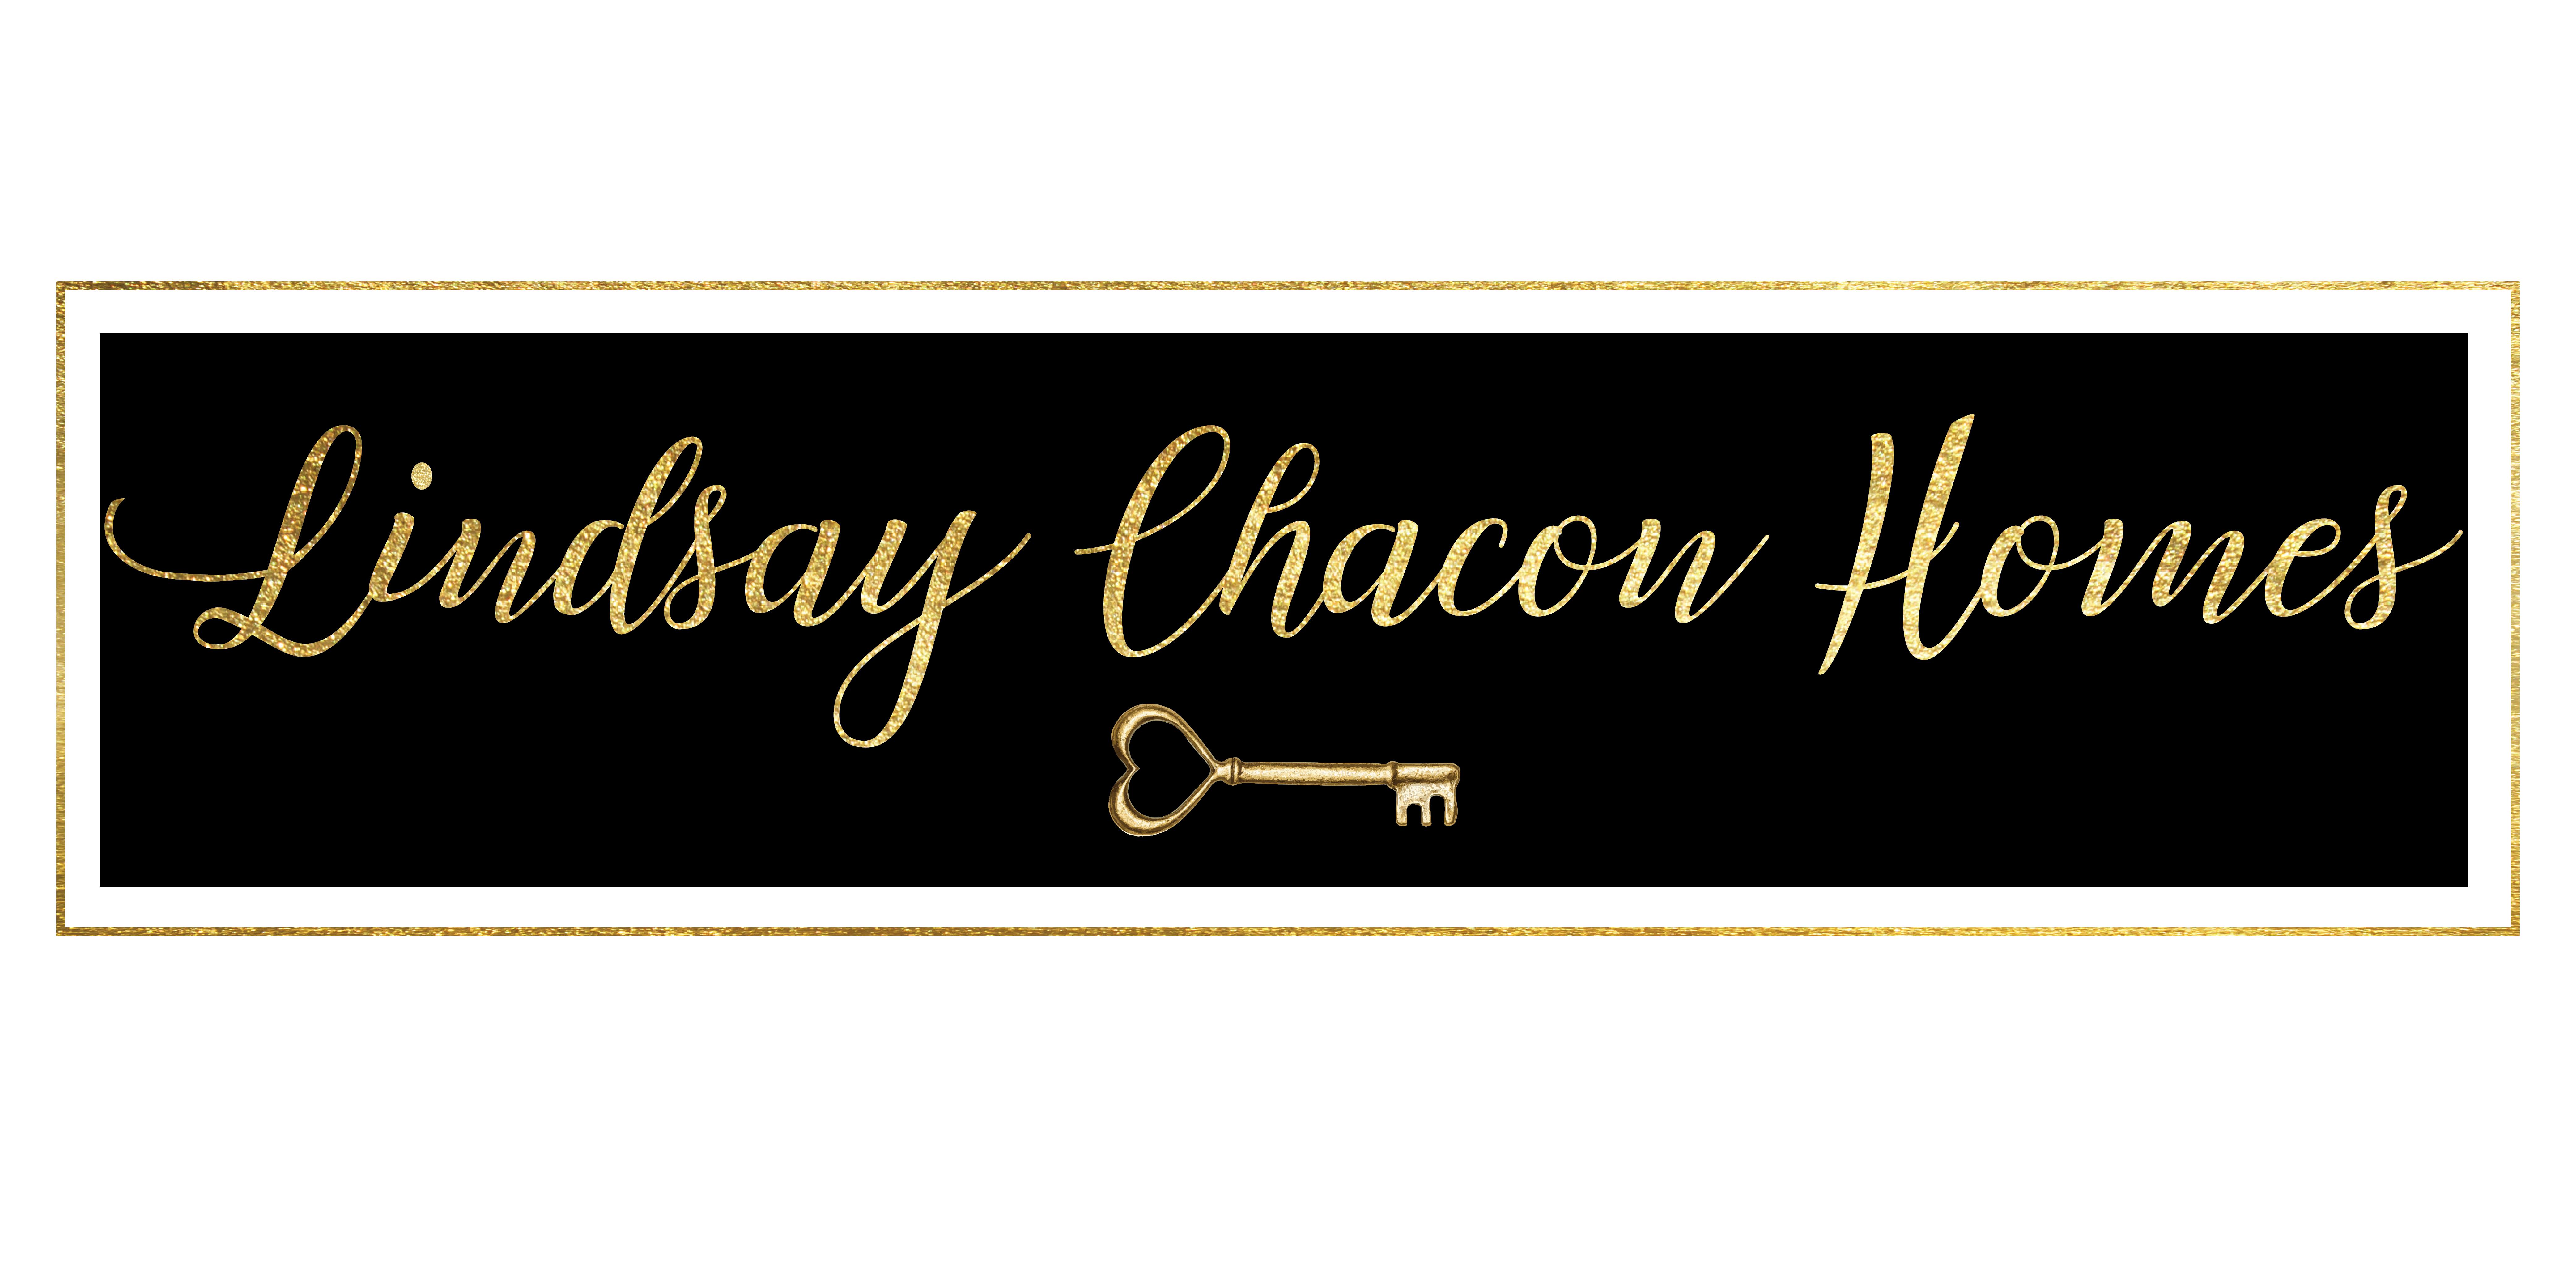 Lindsay Chacon